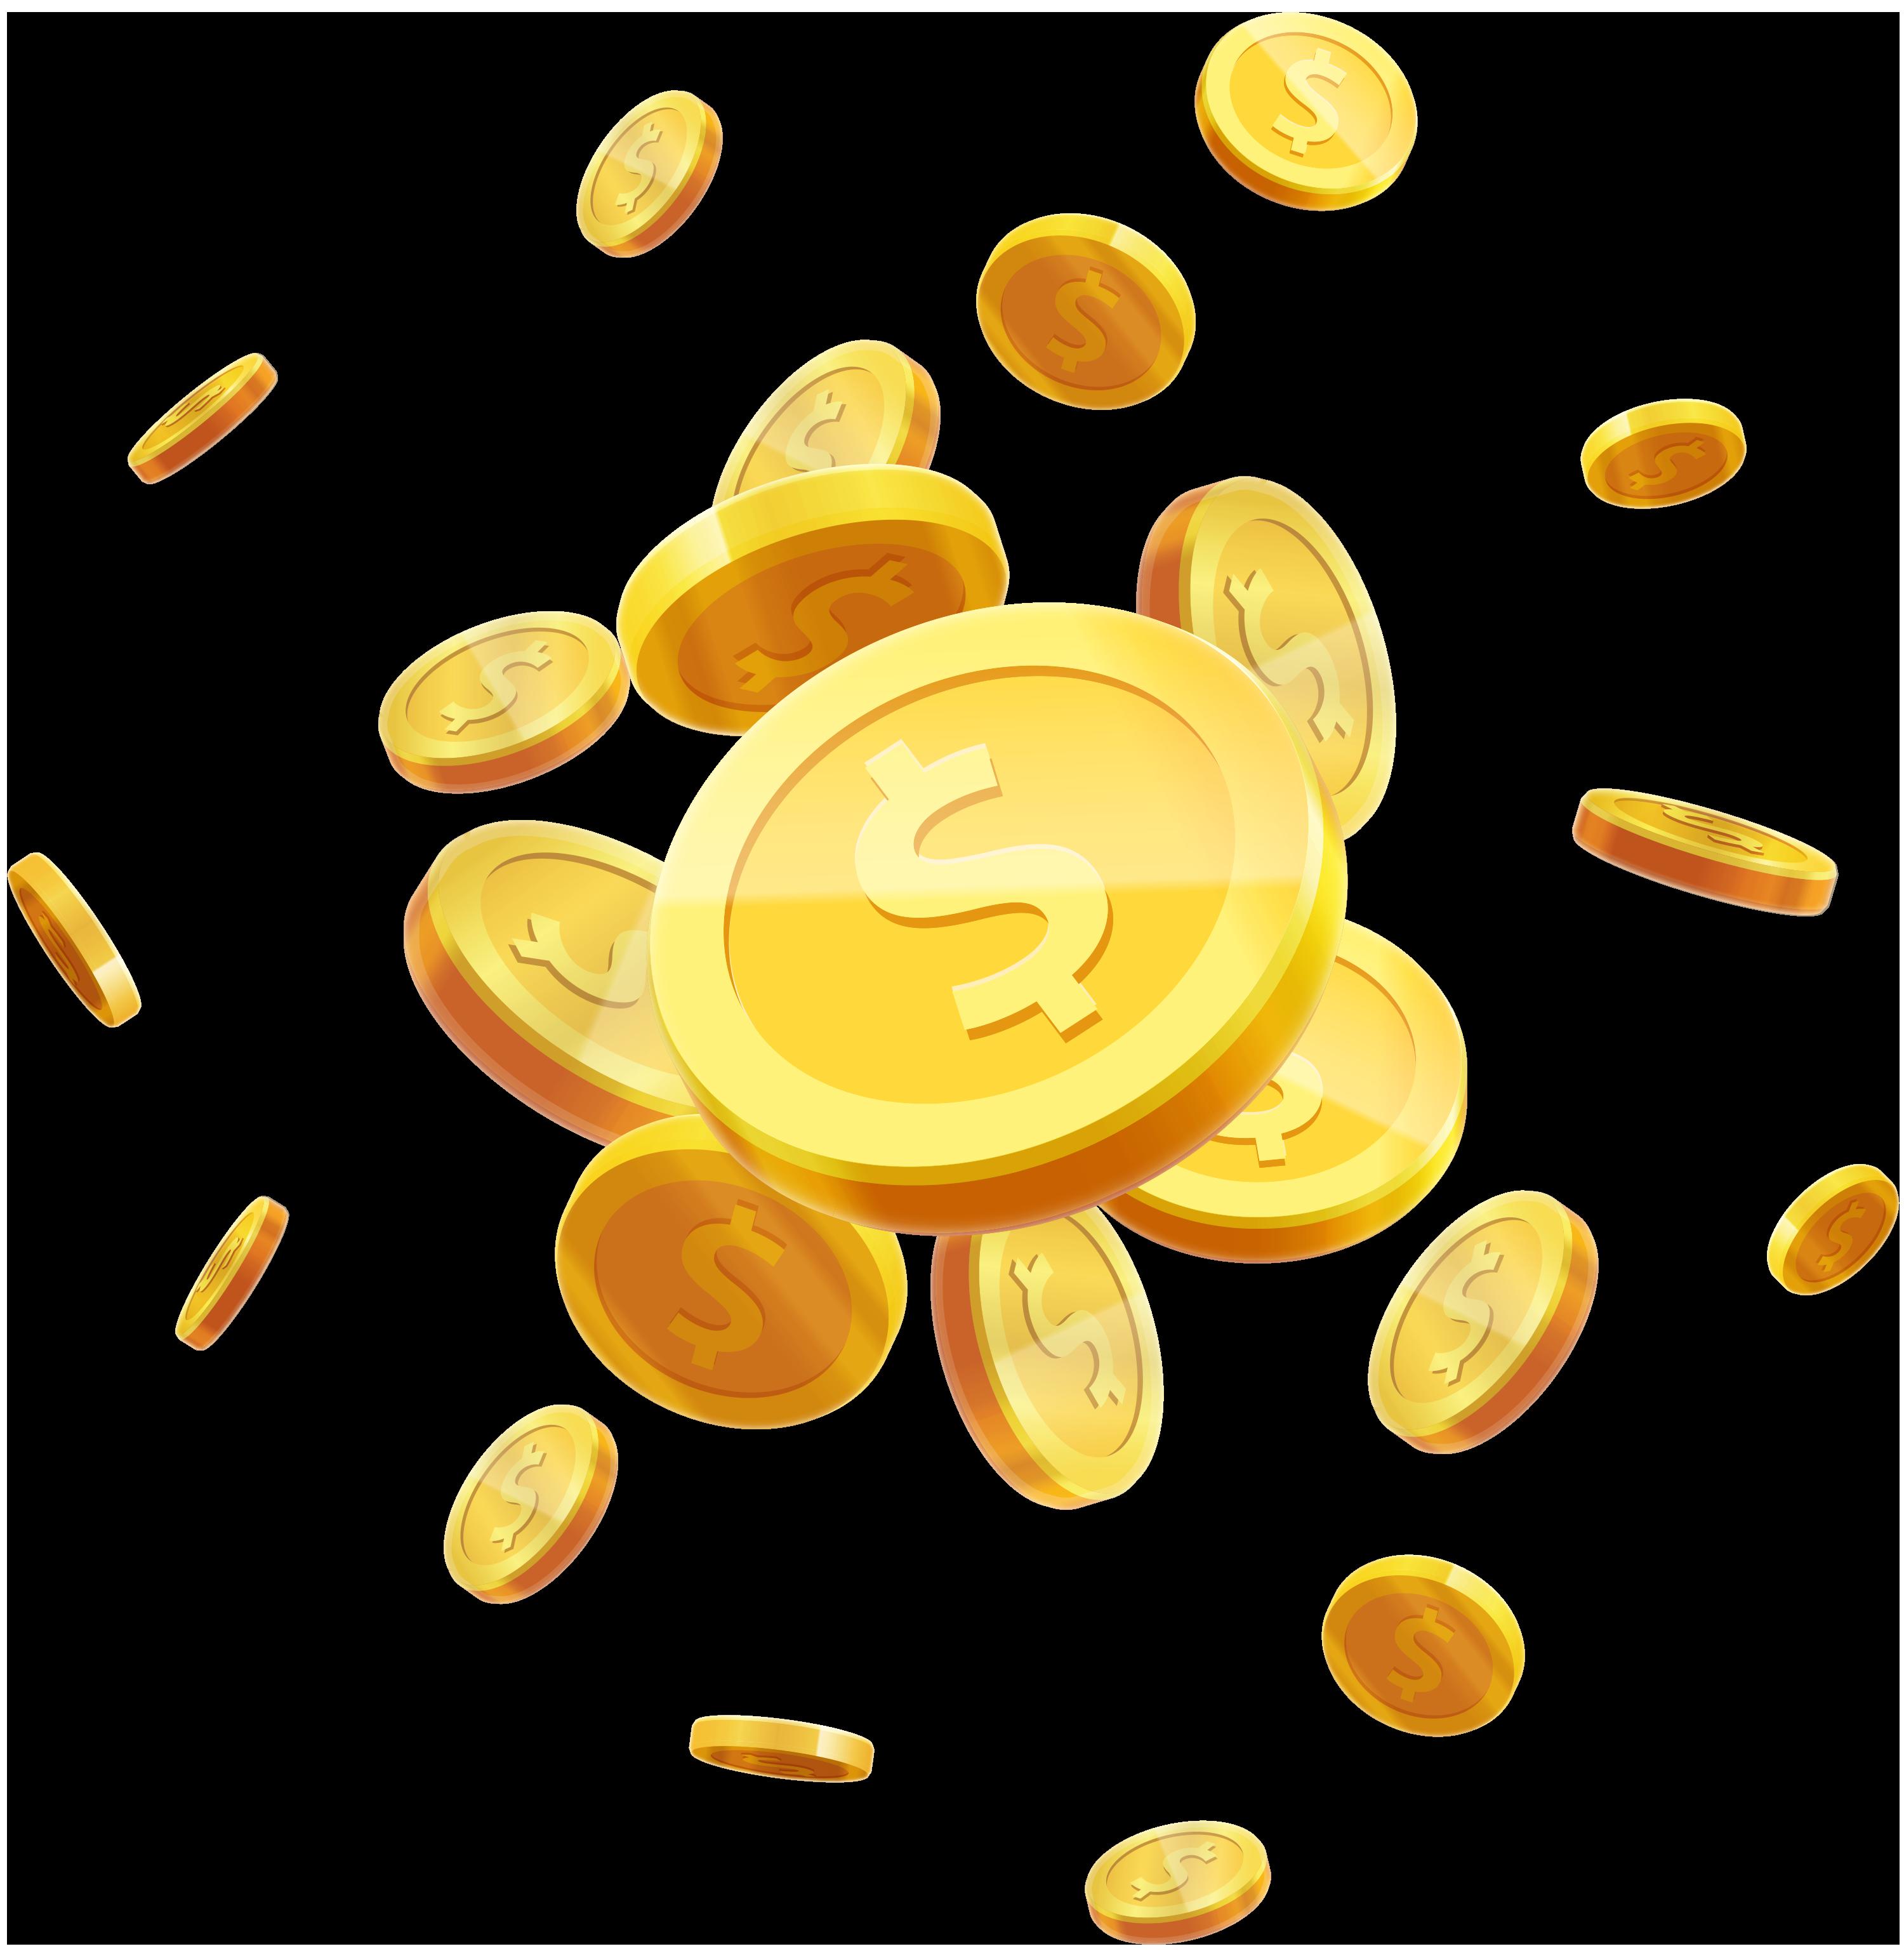 Pin by polin射鸡湿 on 图标 金币、钻石